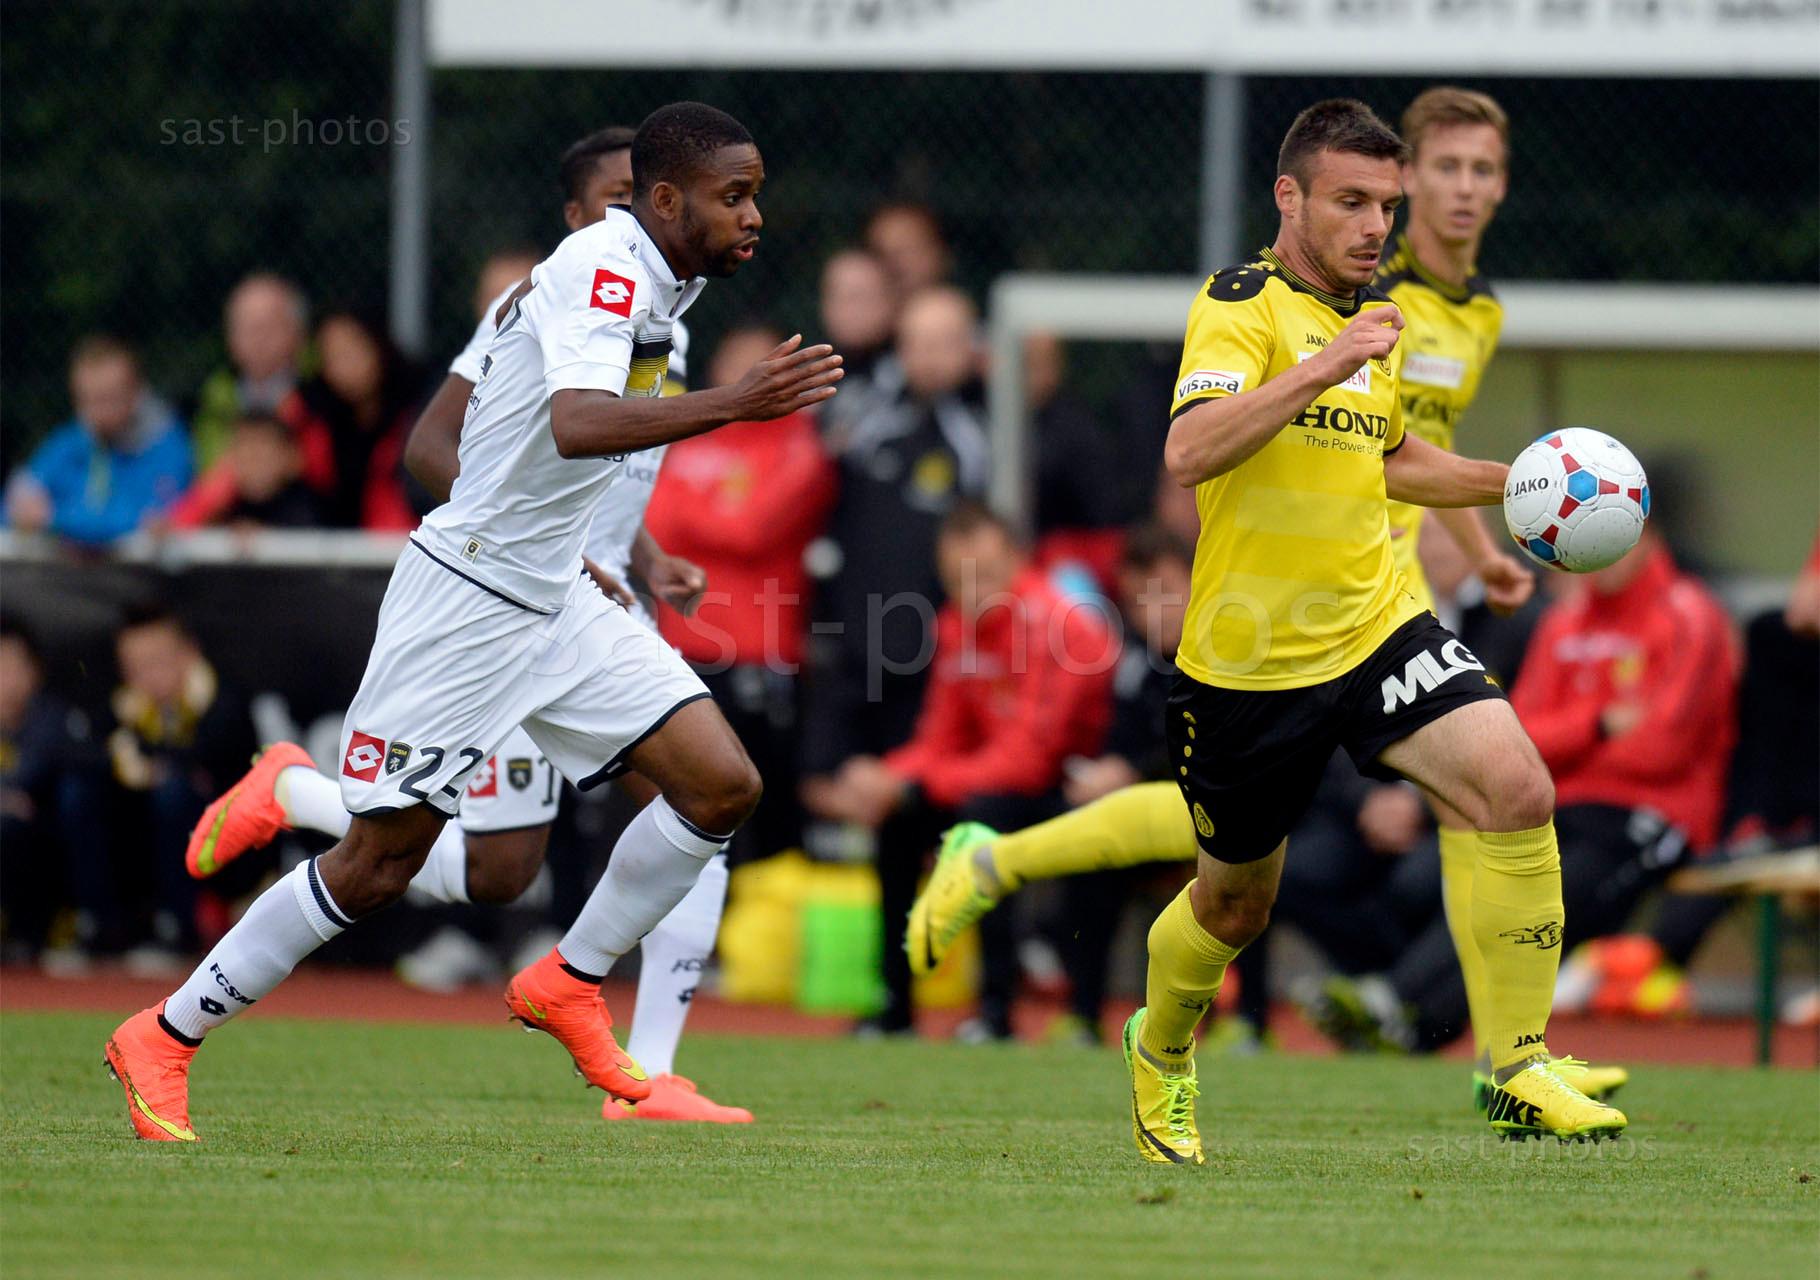 Cedric Bakambu (Sochaux) gegen Milan Gajic (YB)